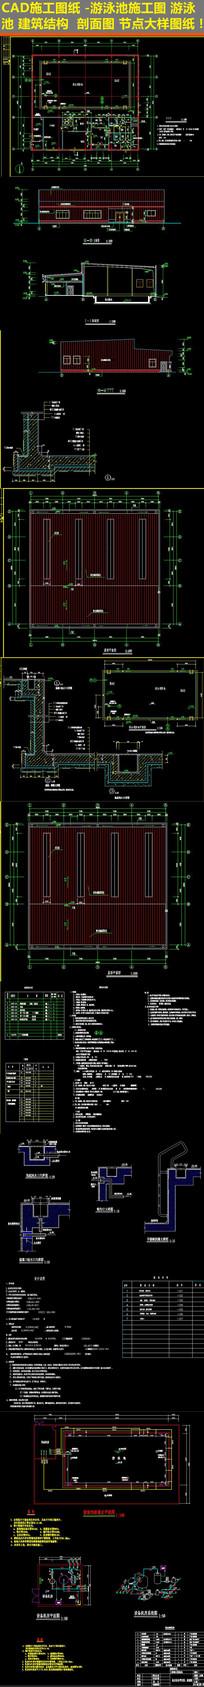 CAD游泳池建筑节点施工图 dwg